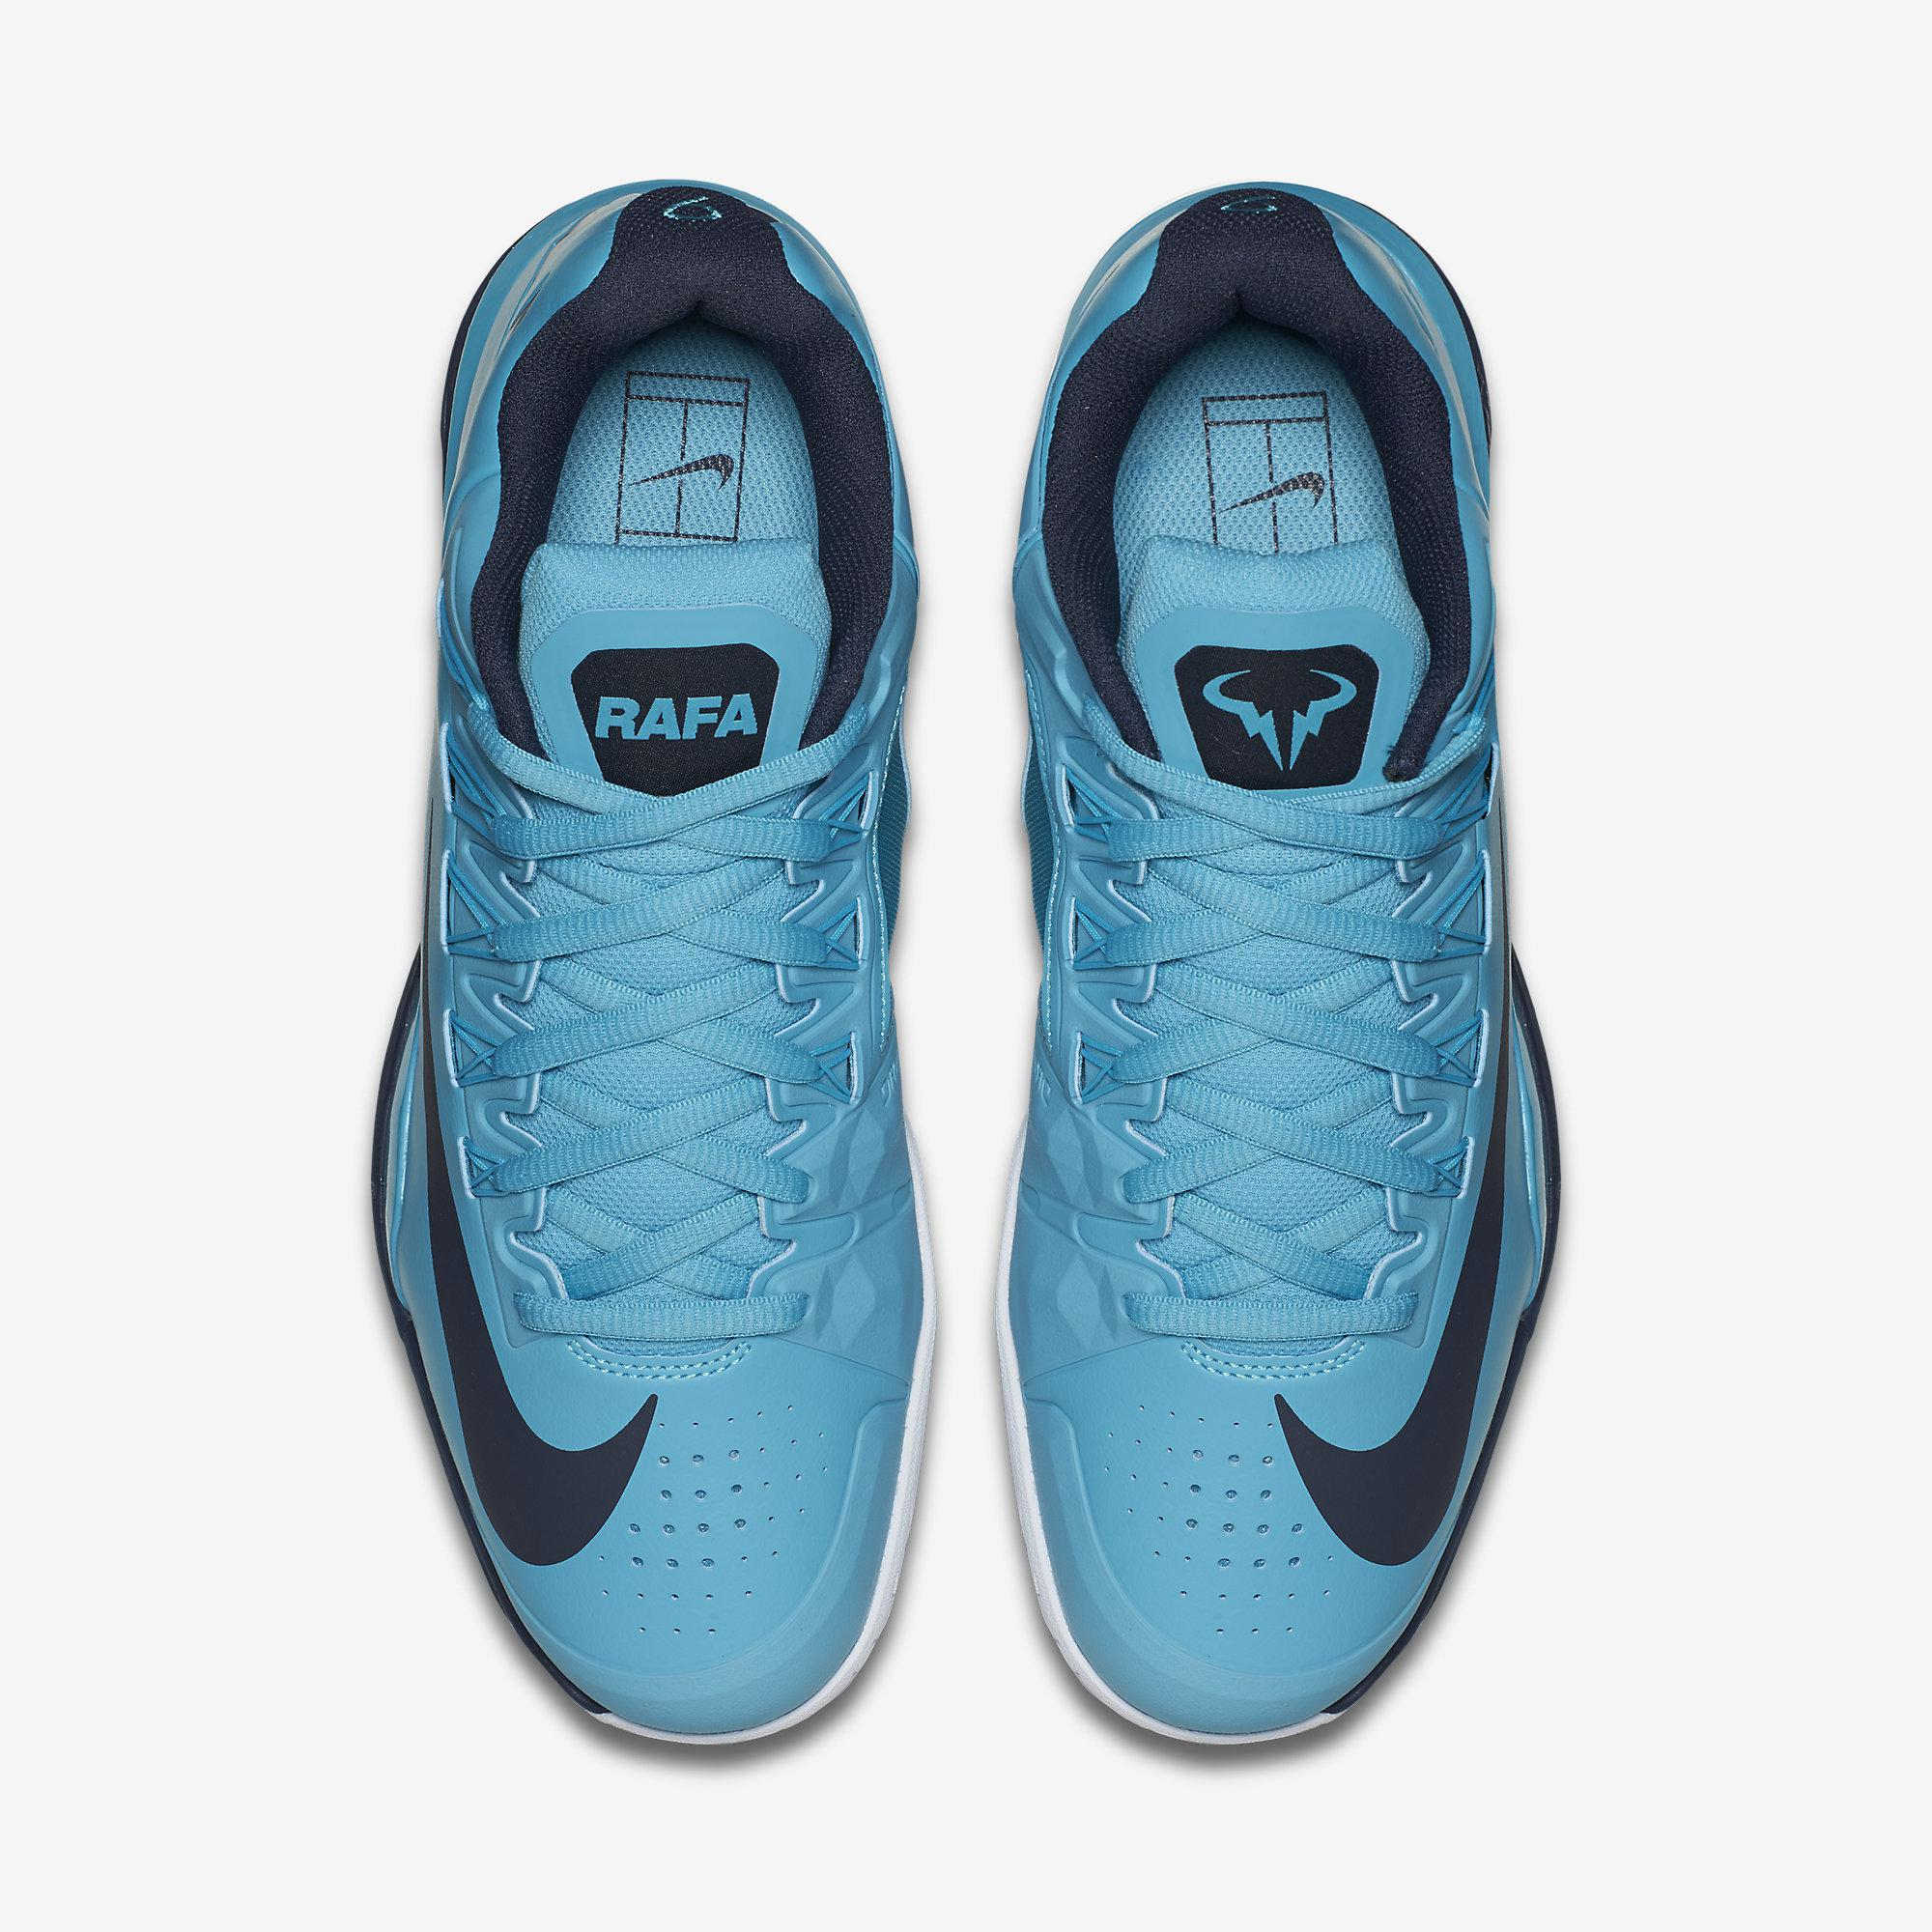 new arrival b80bb 496db Nike Mens Lunar Ballistec 1.5 LG Tennis Shoes - Omega Blue